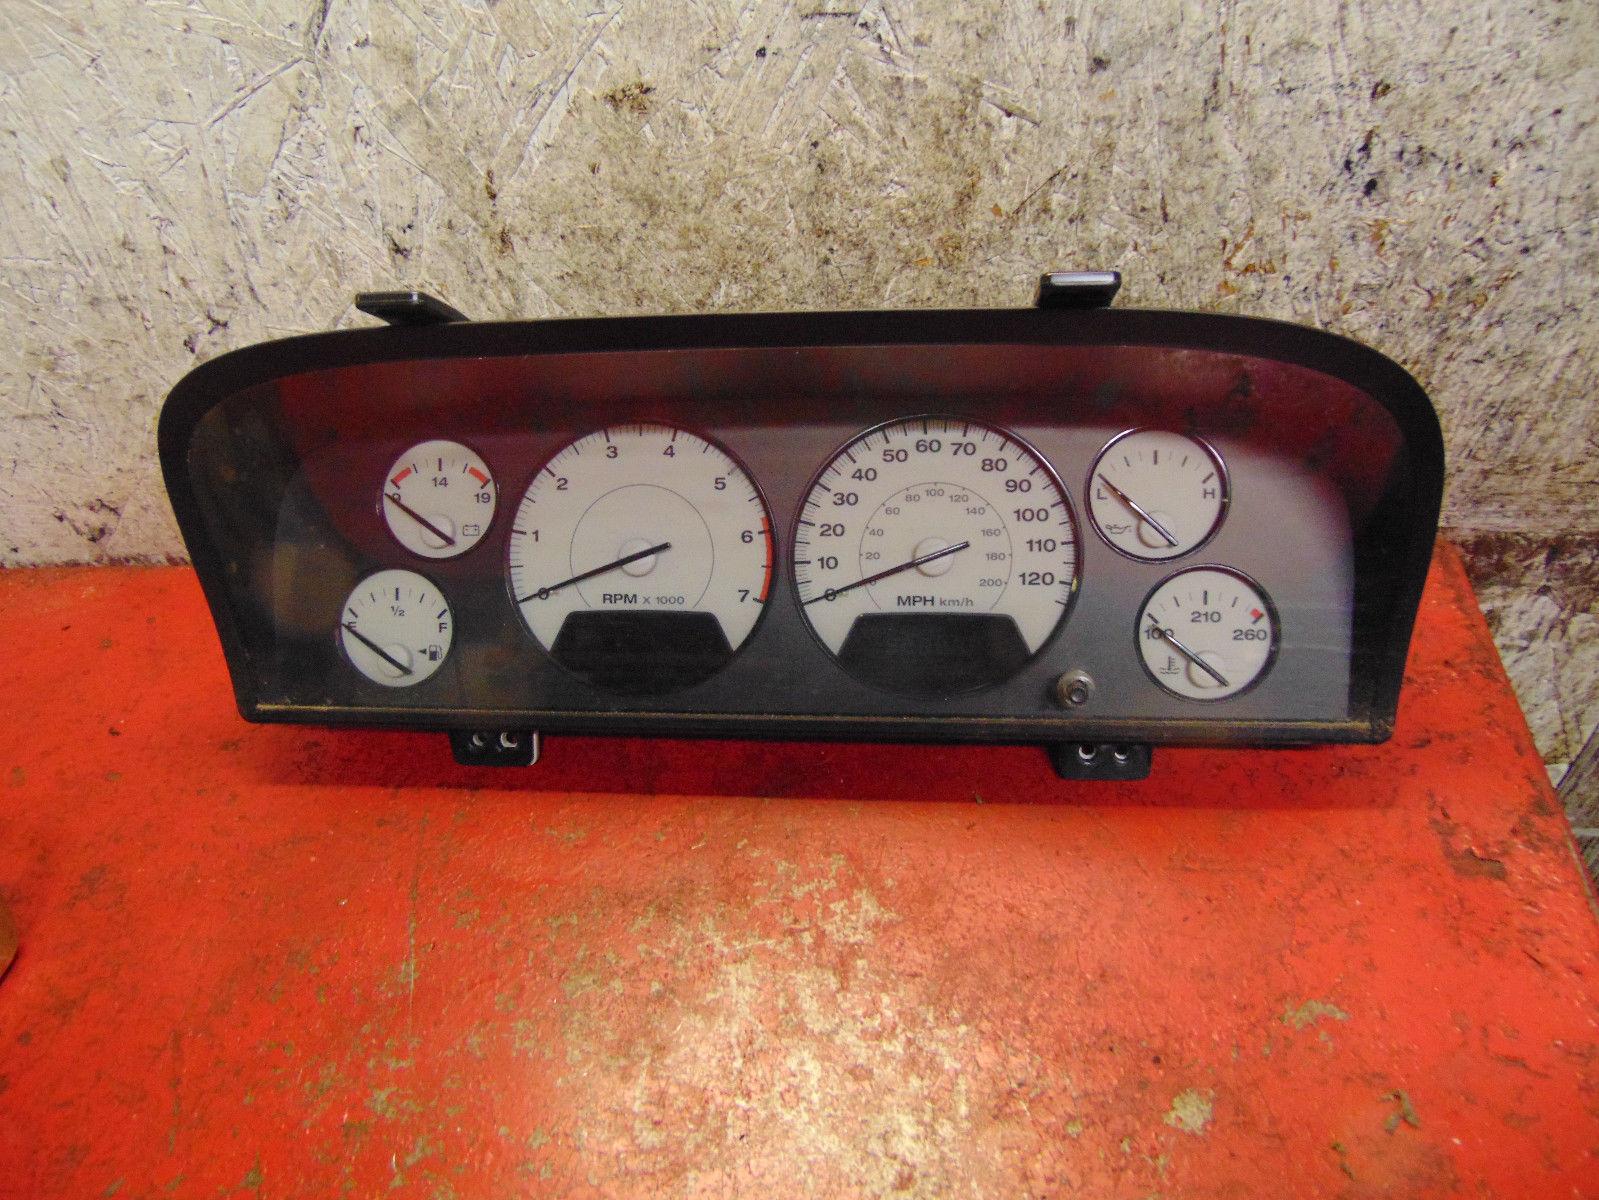 03 04 02 jeep grand cherokee speedometer instrument gauge. Black Bedroom Furniture Sets. Home Design Ideas